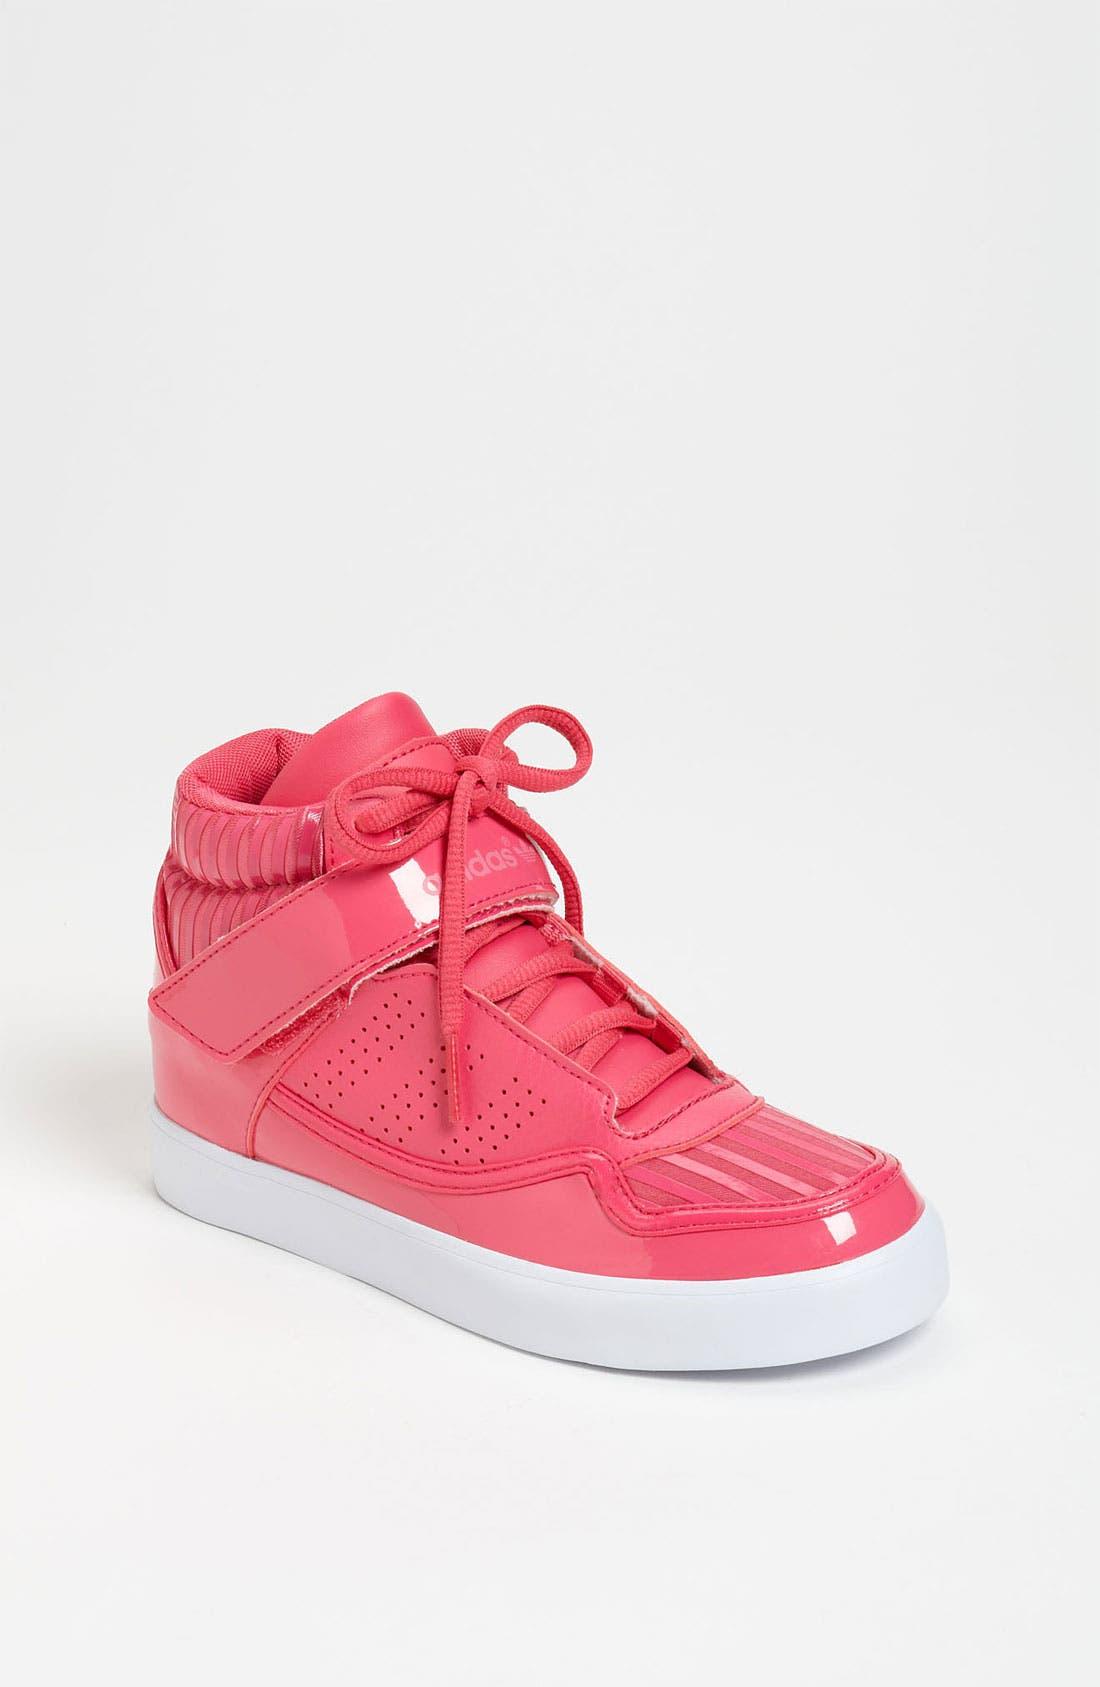 Main Image - adidas 'AR 2.0' Sneaker (Toddler & Little Kid)